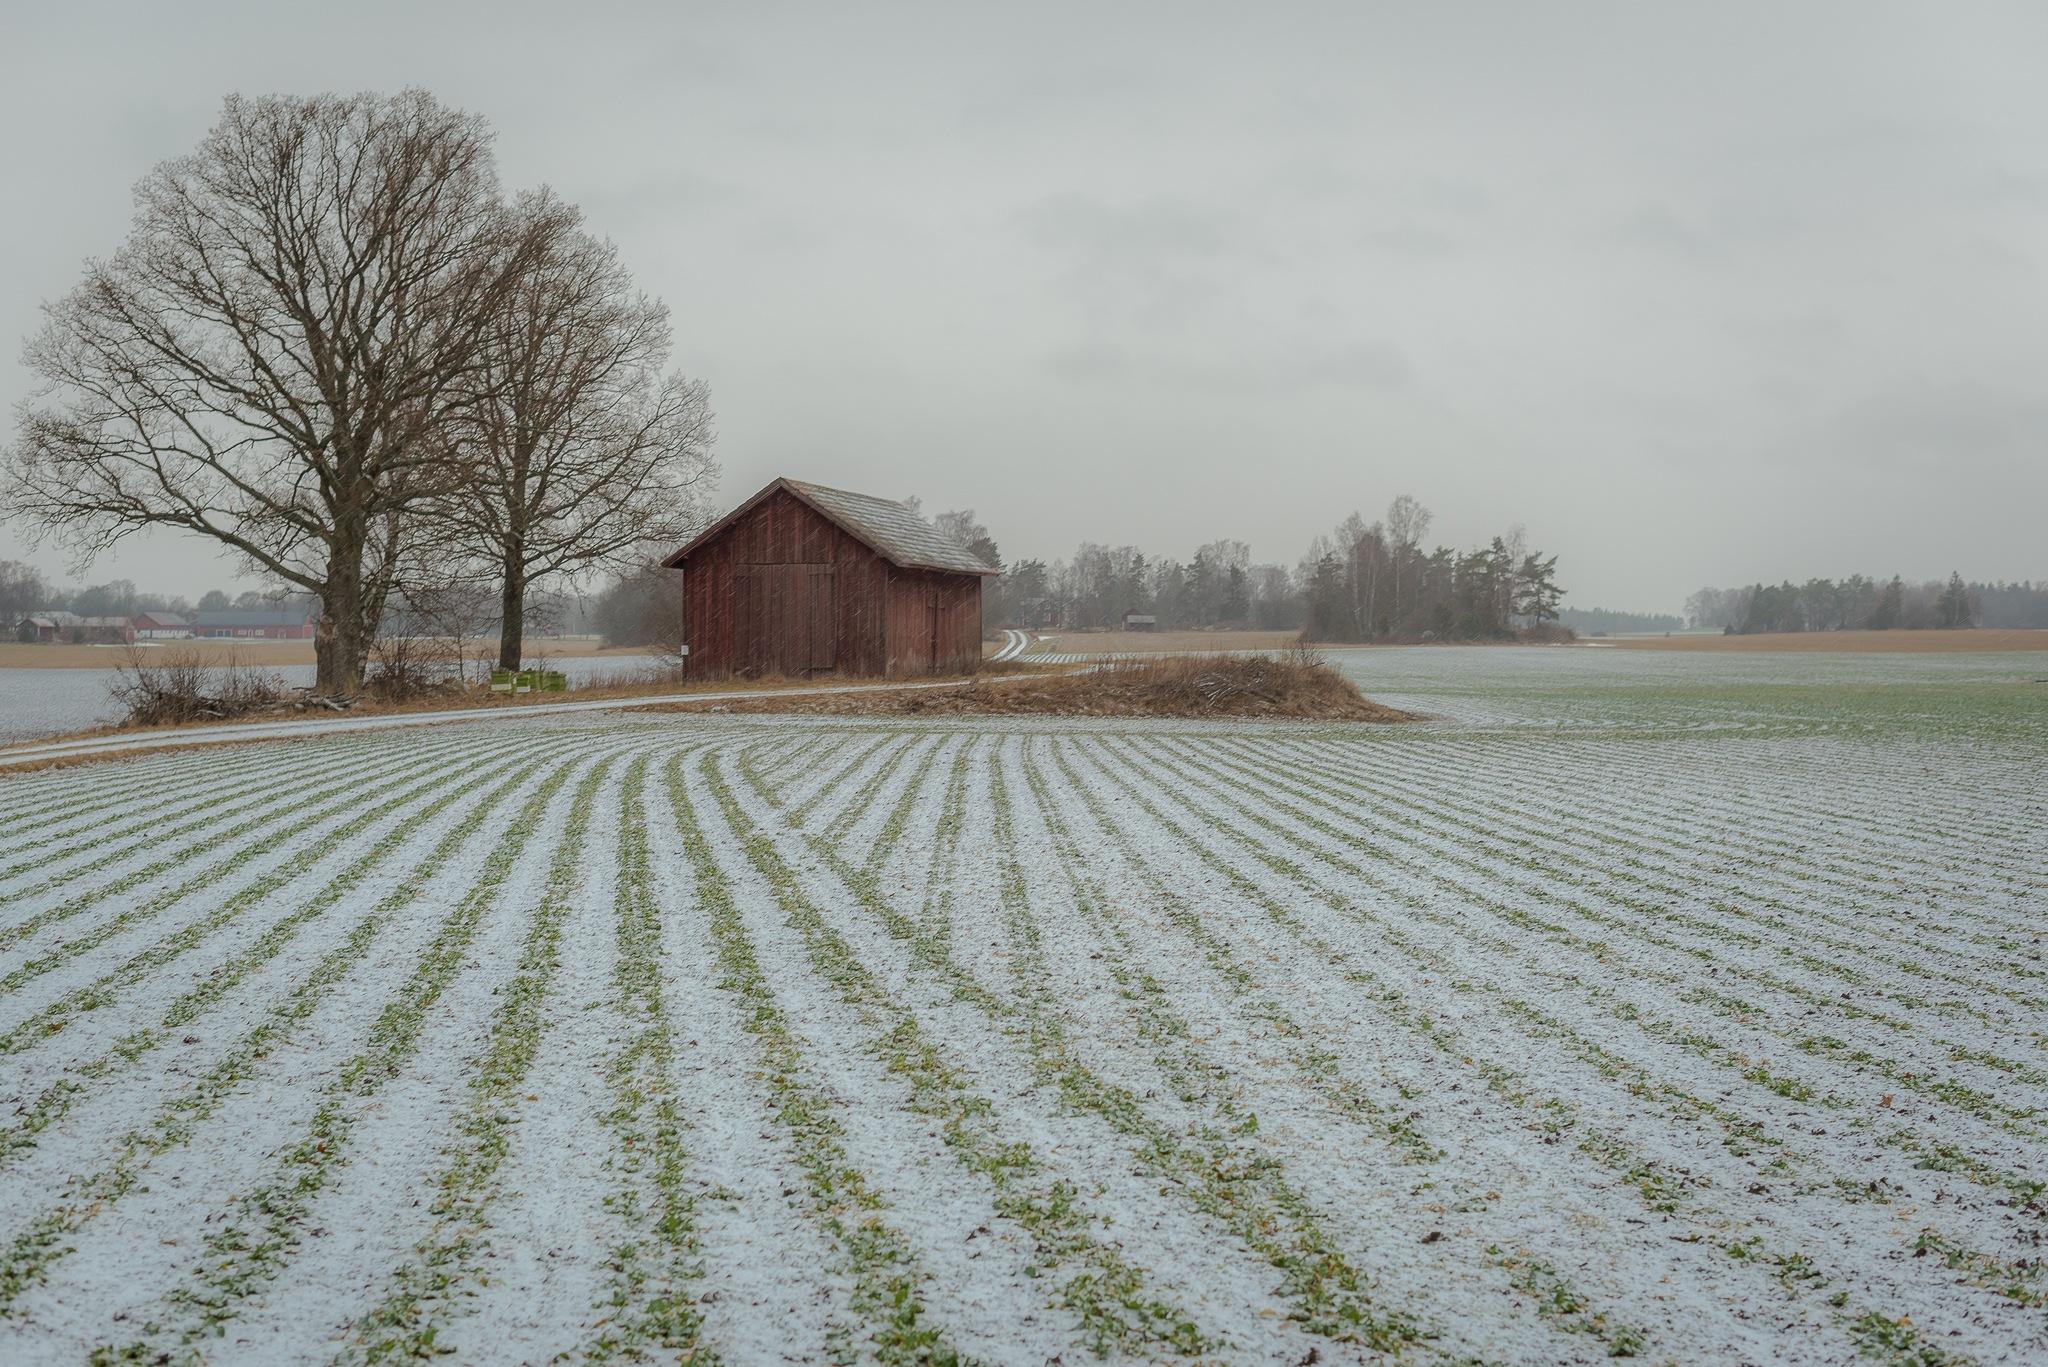 Sown with precision by Fotojocke